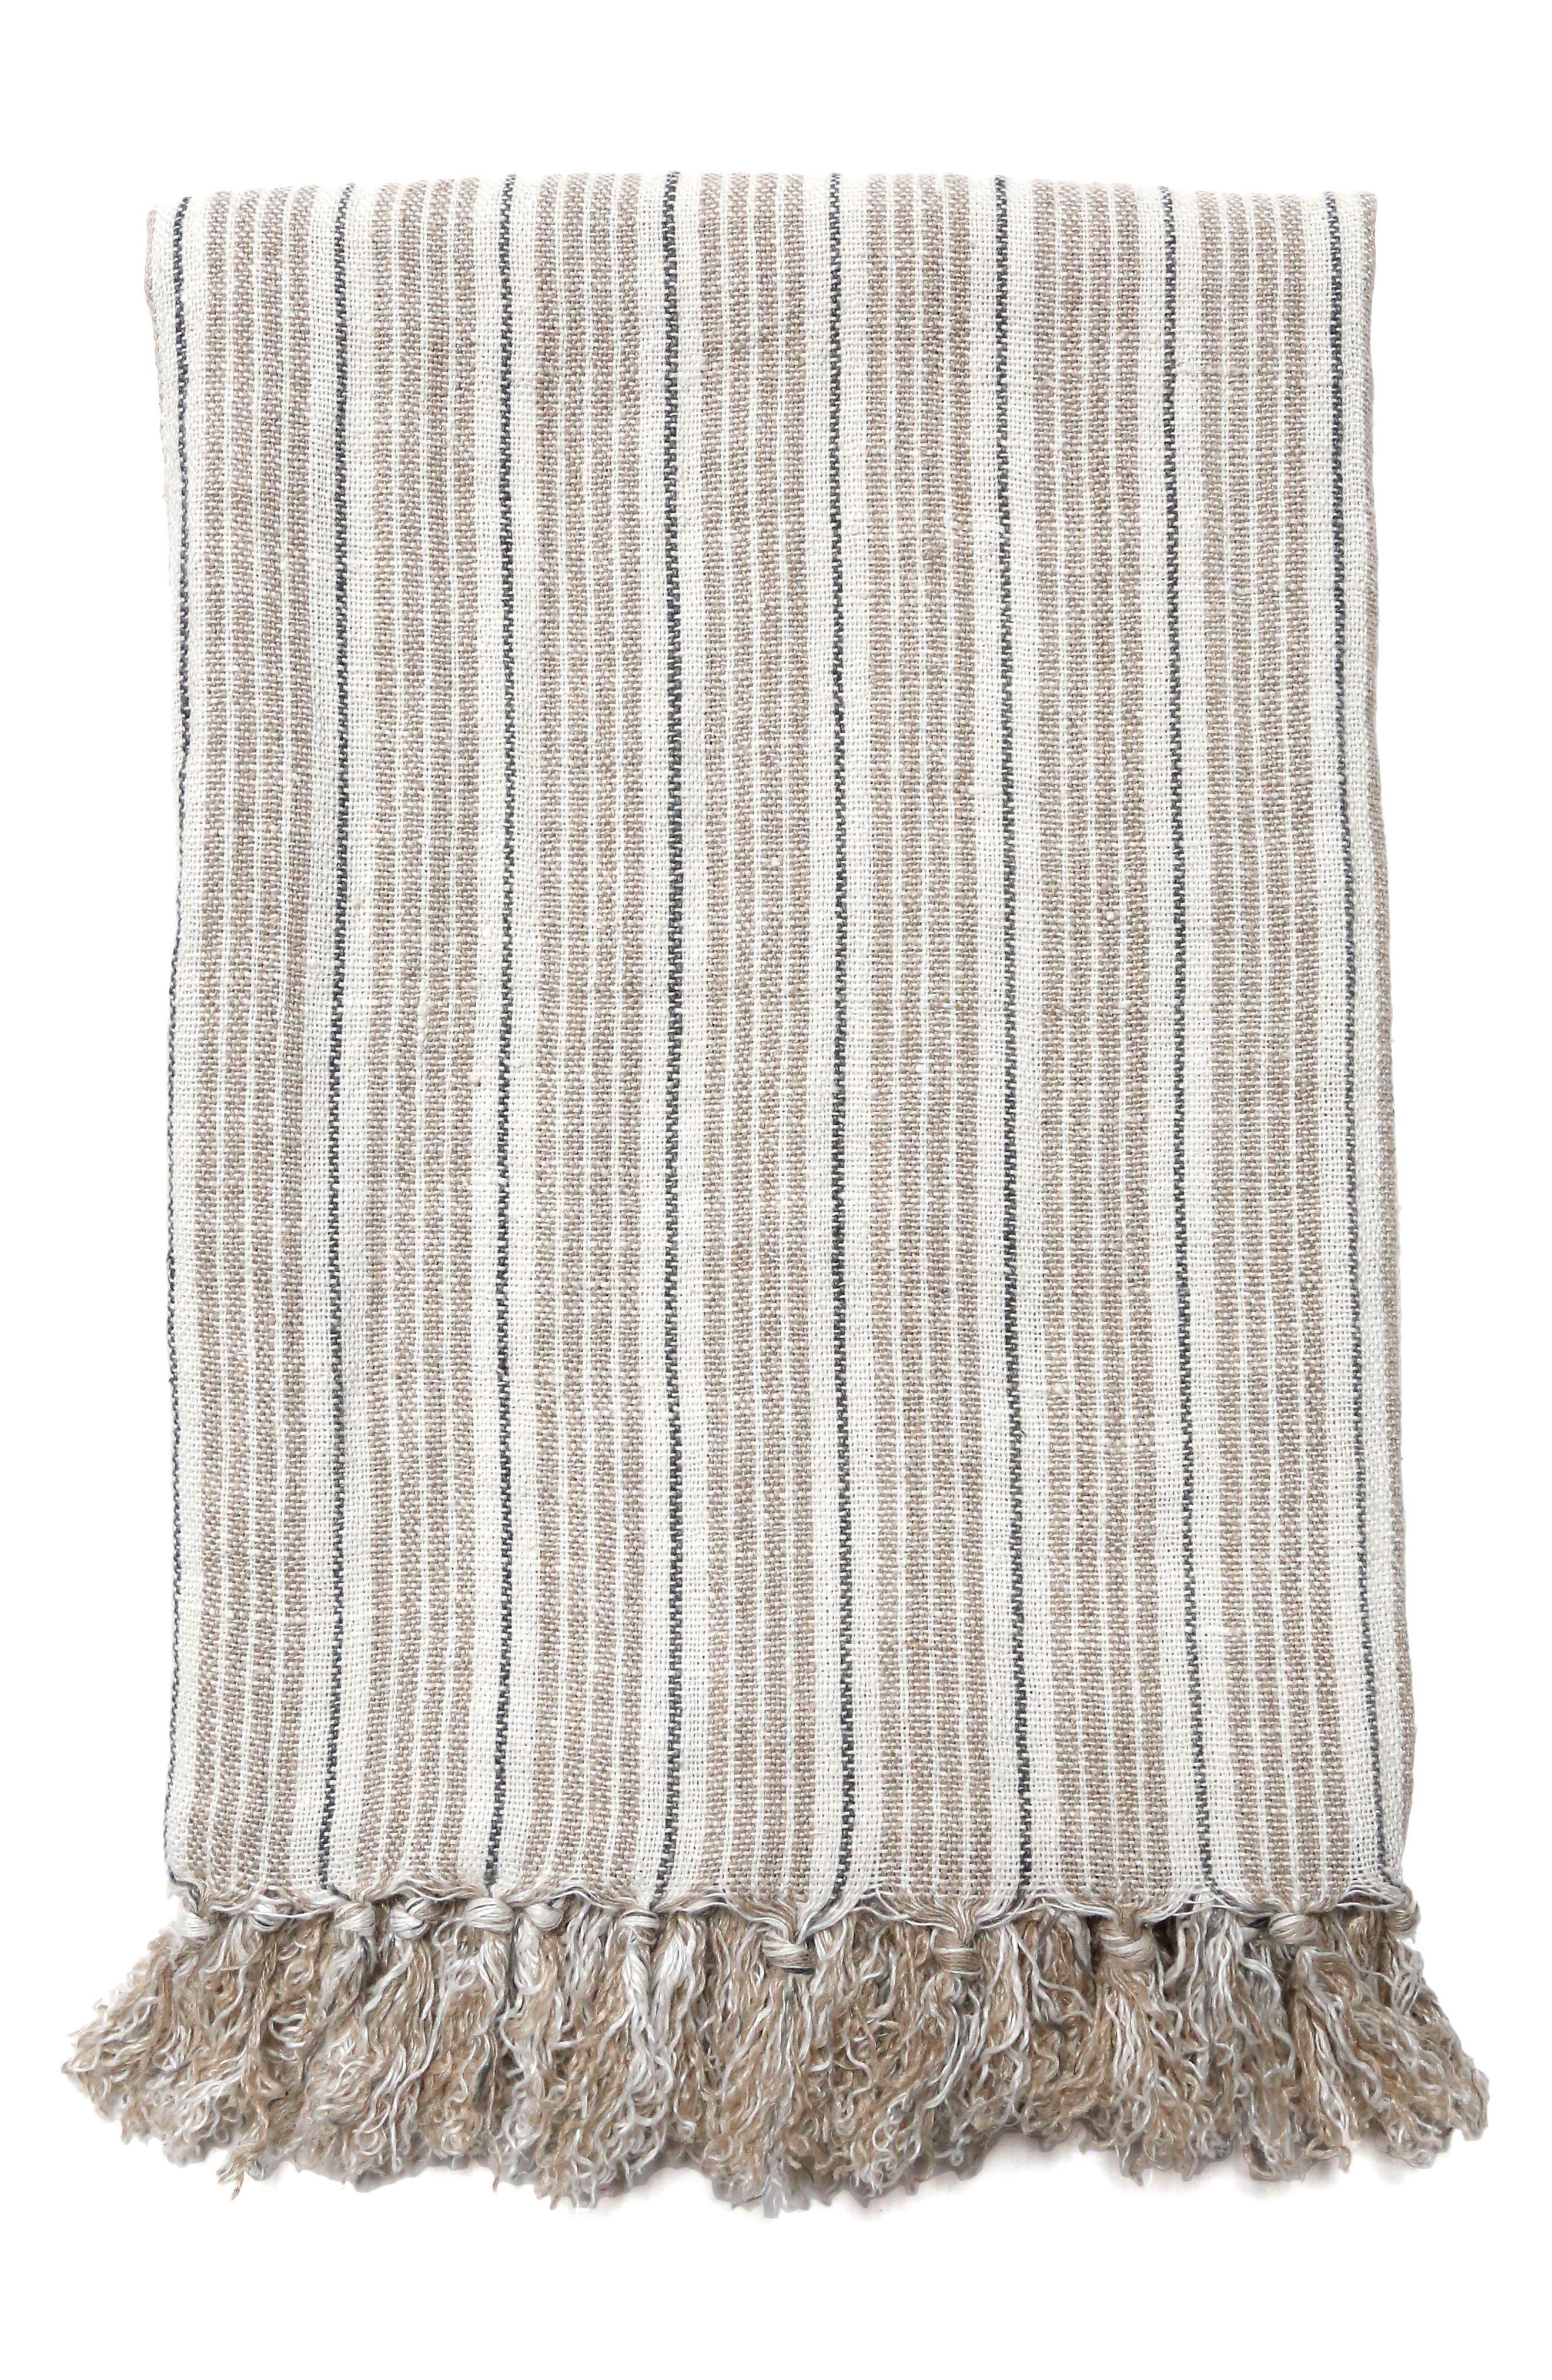 Pom Pom at Home Newport Throw Blanket